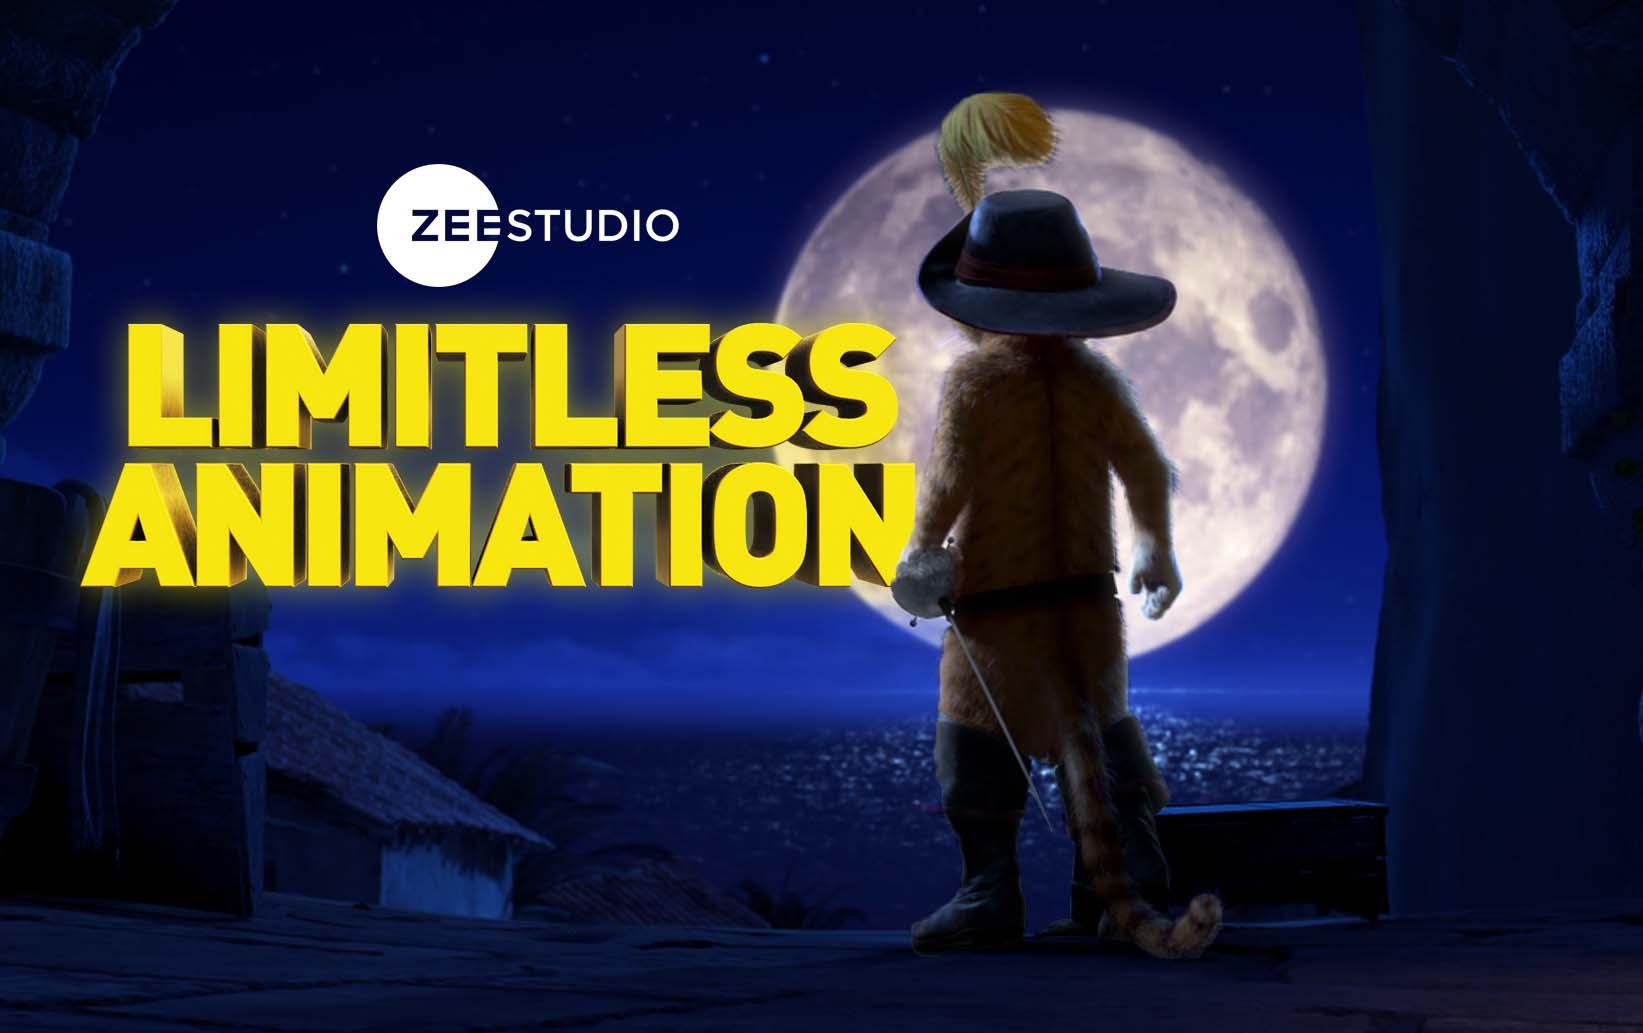 Limitless Animation